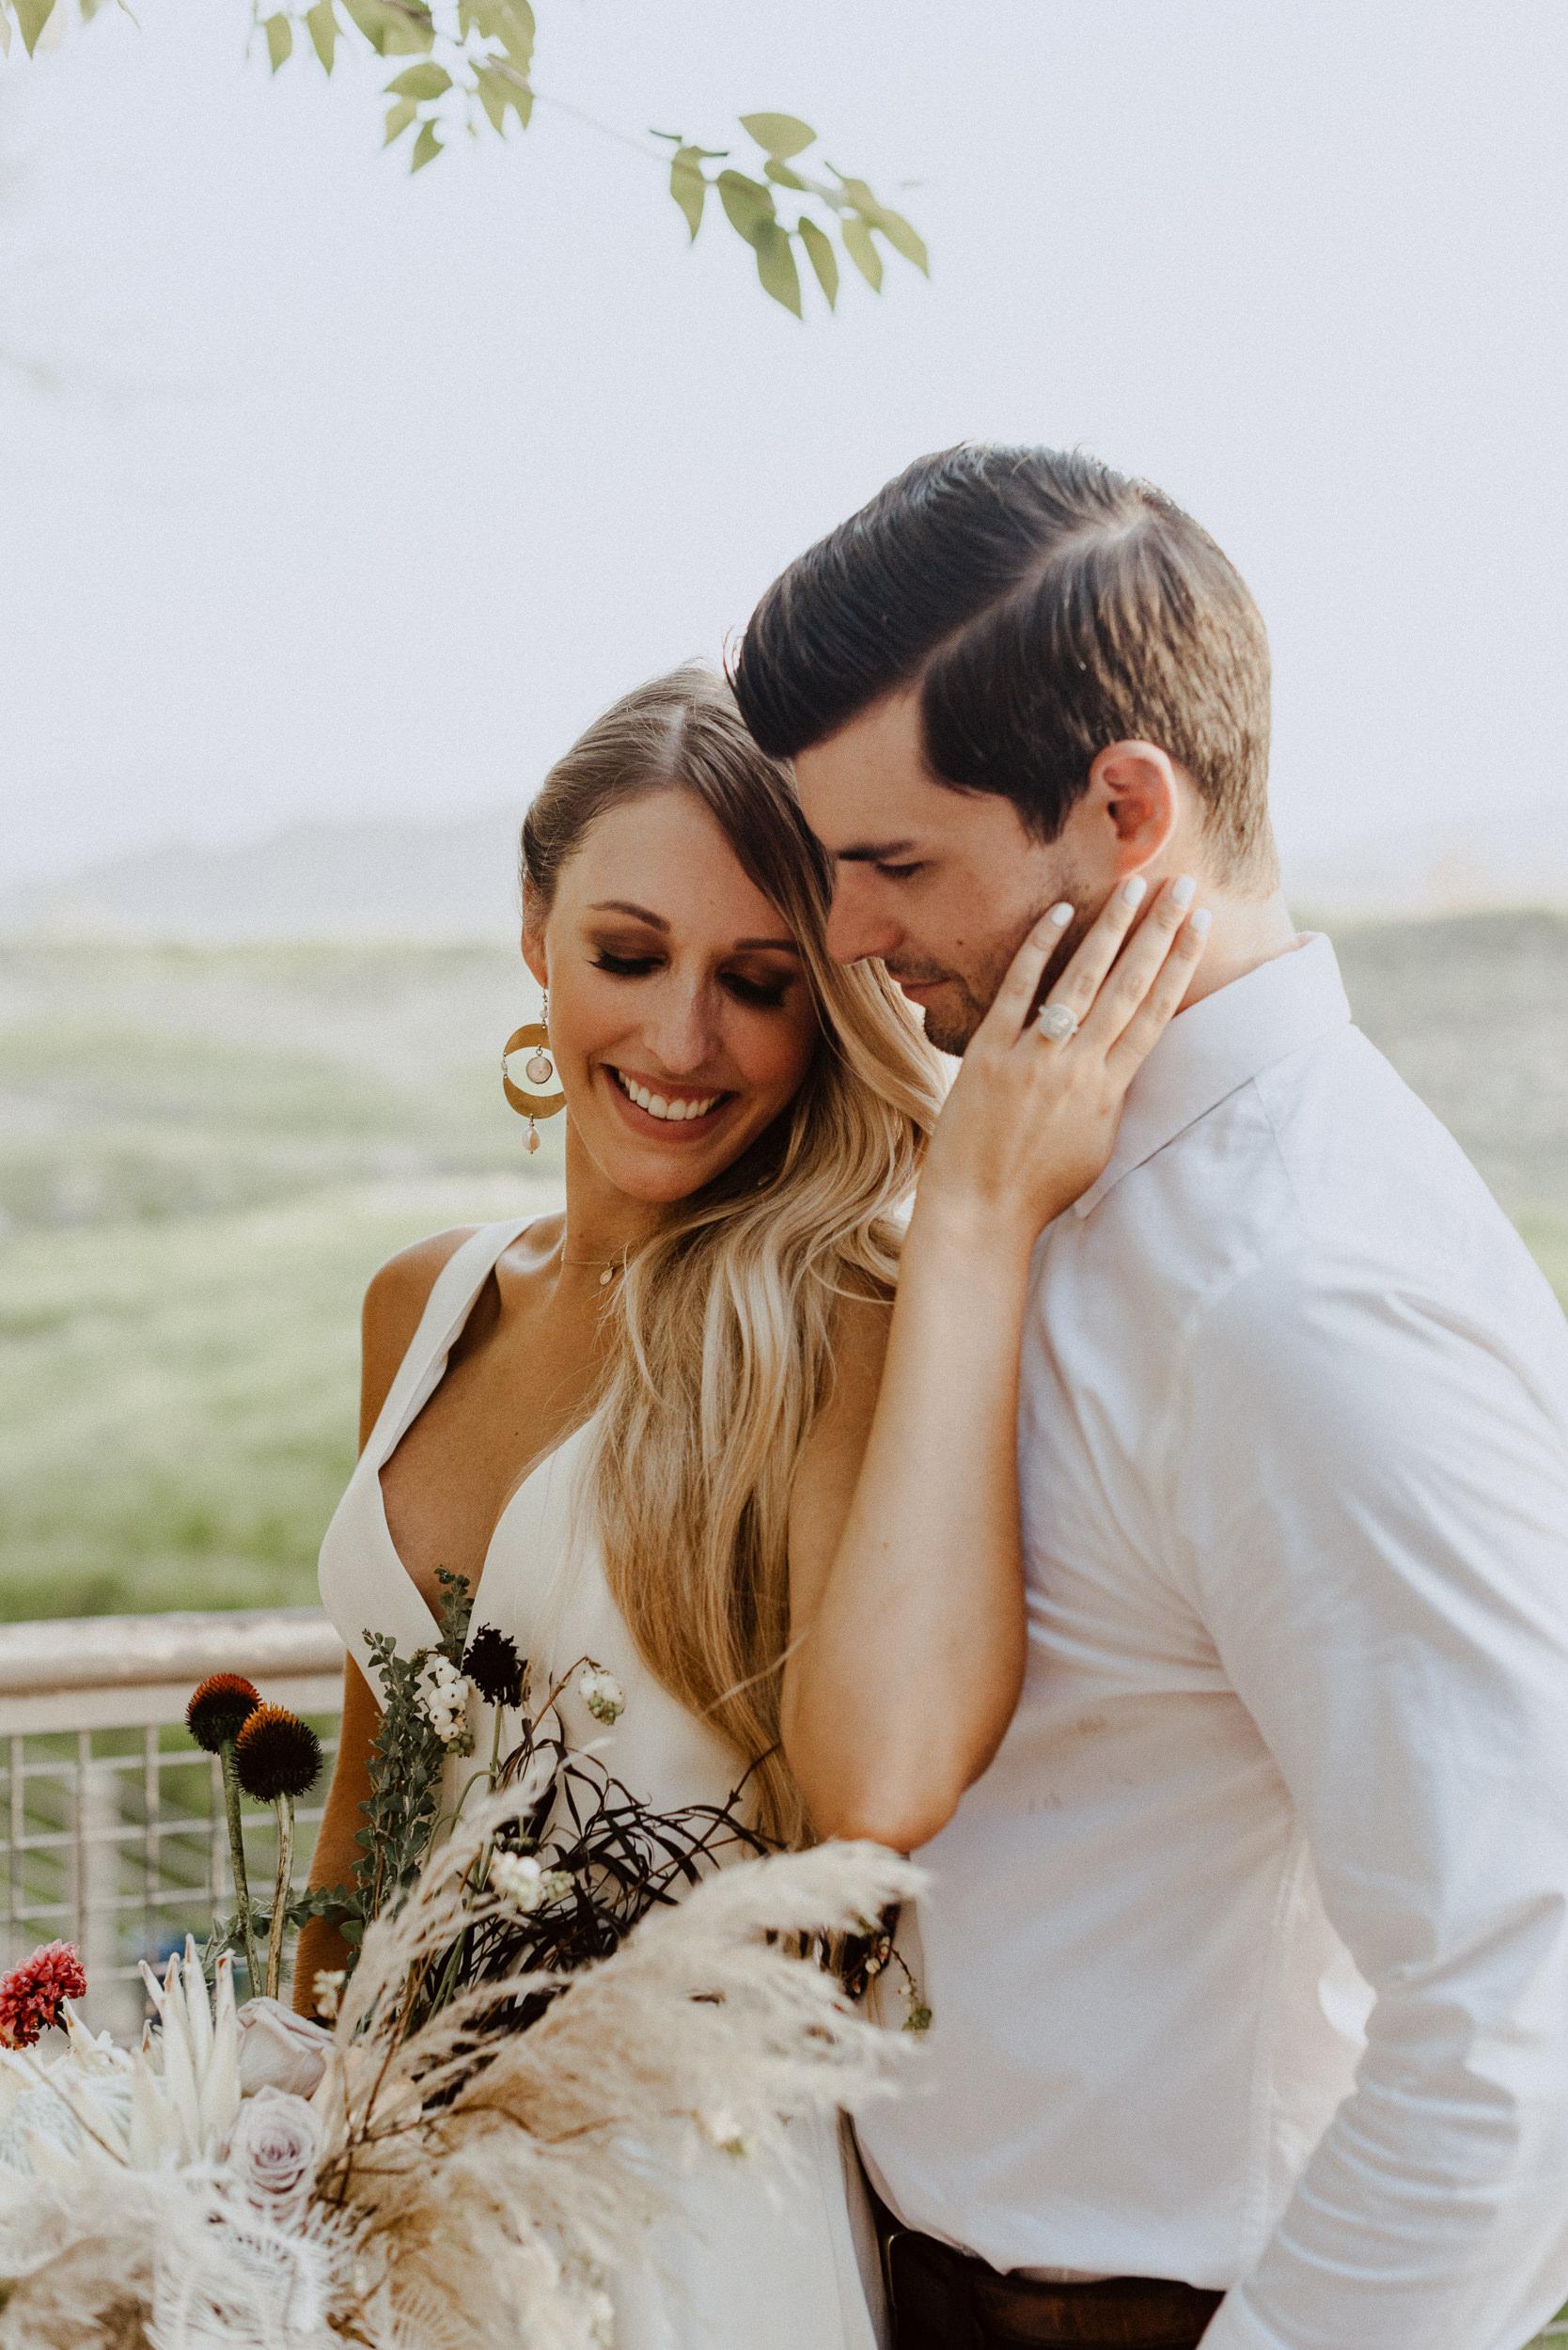 sChelsie + Chris - The Desert Shootout Wedding Romantics at The Living Desert-158.jpg